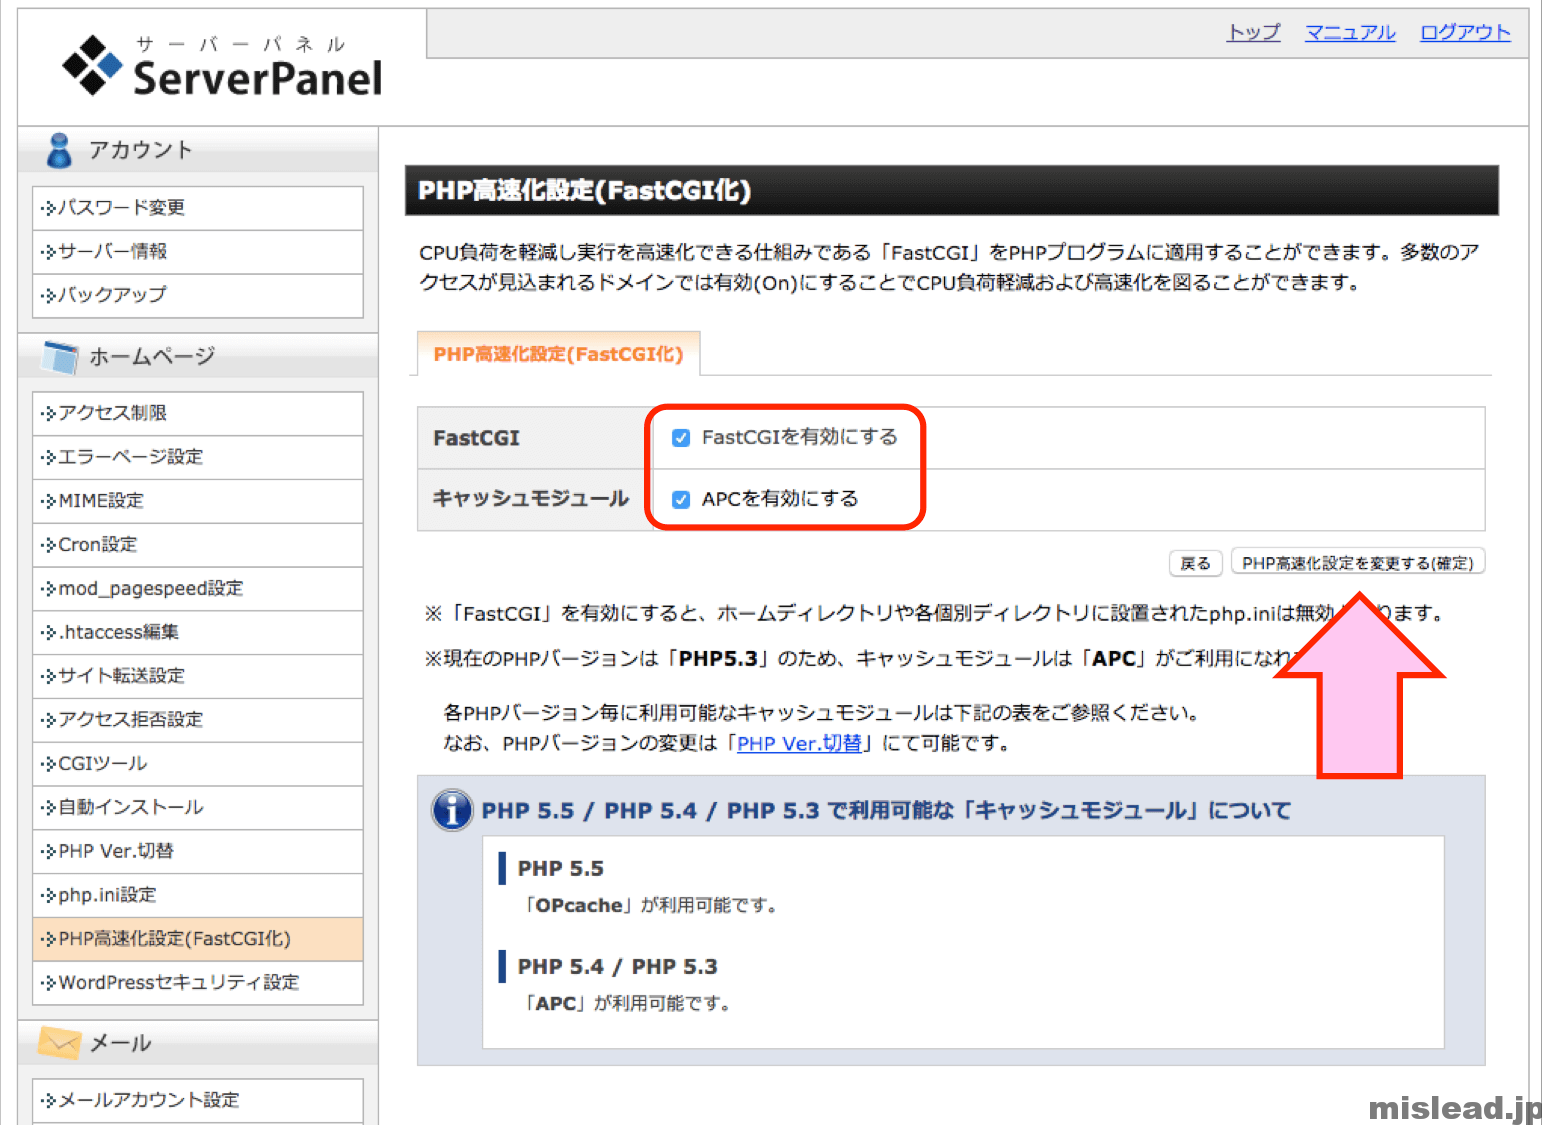 Xserver コントロールパネル FastCGI OPcache